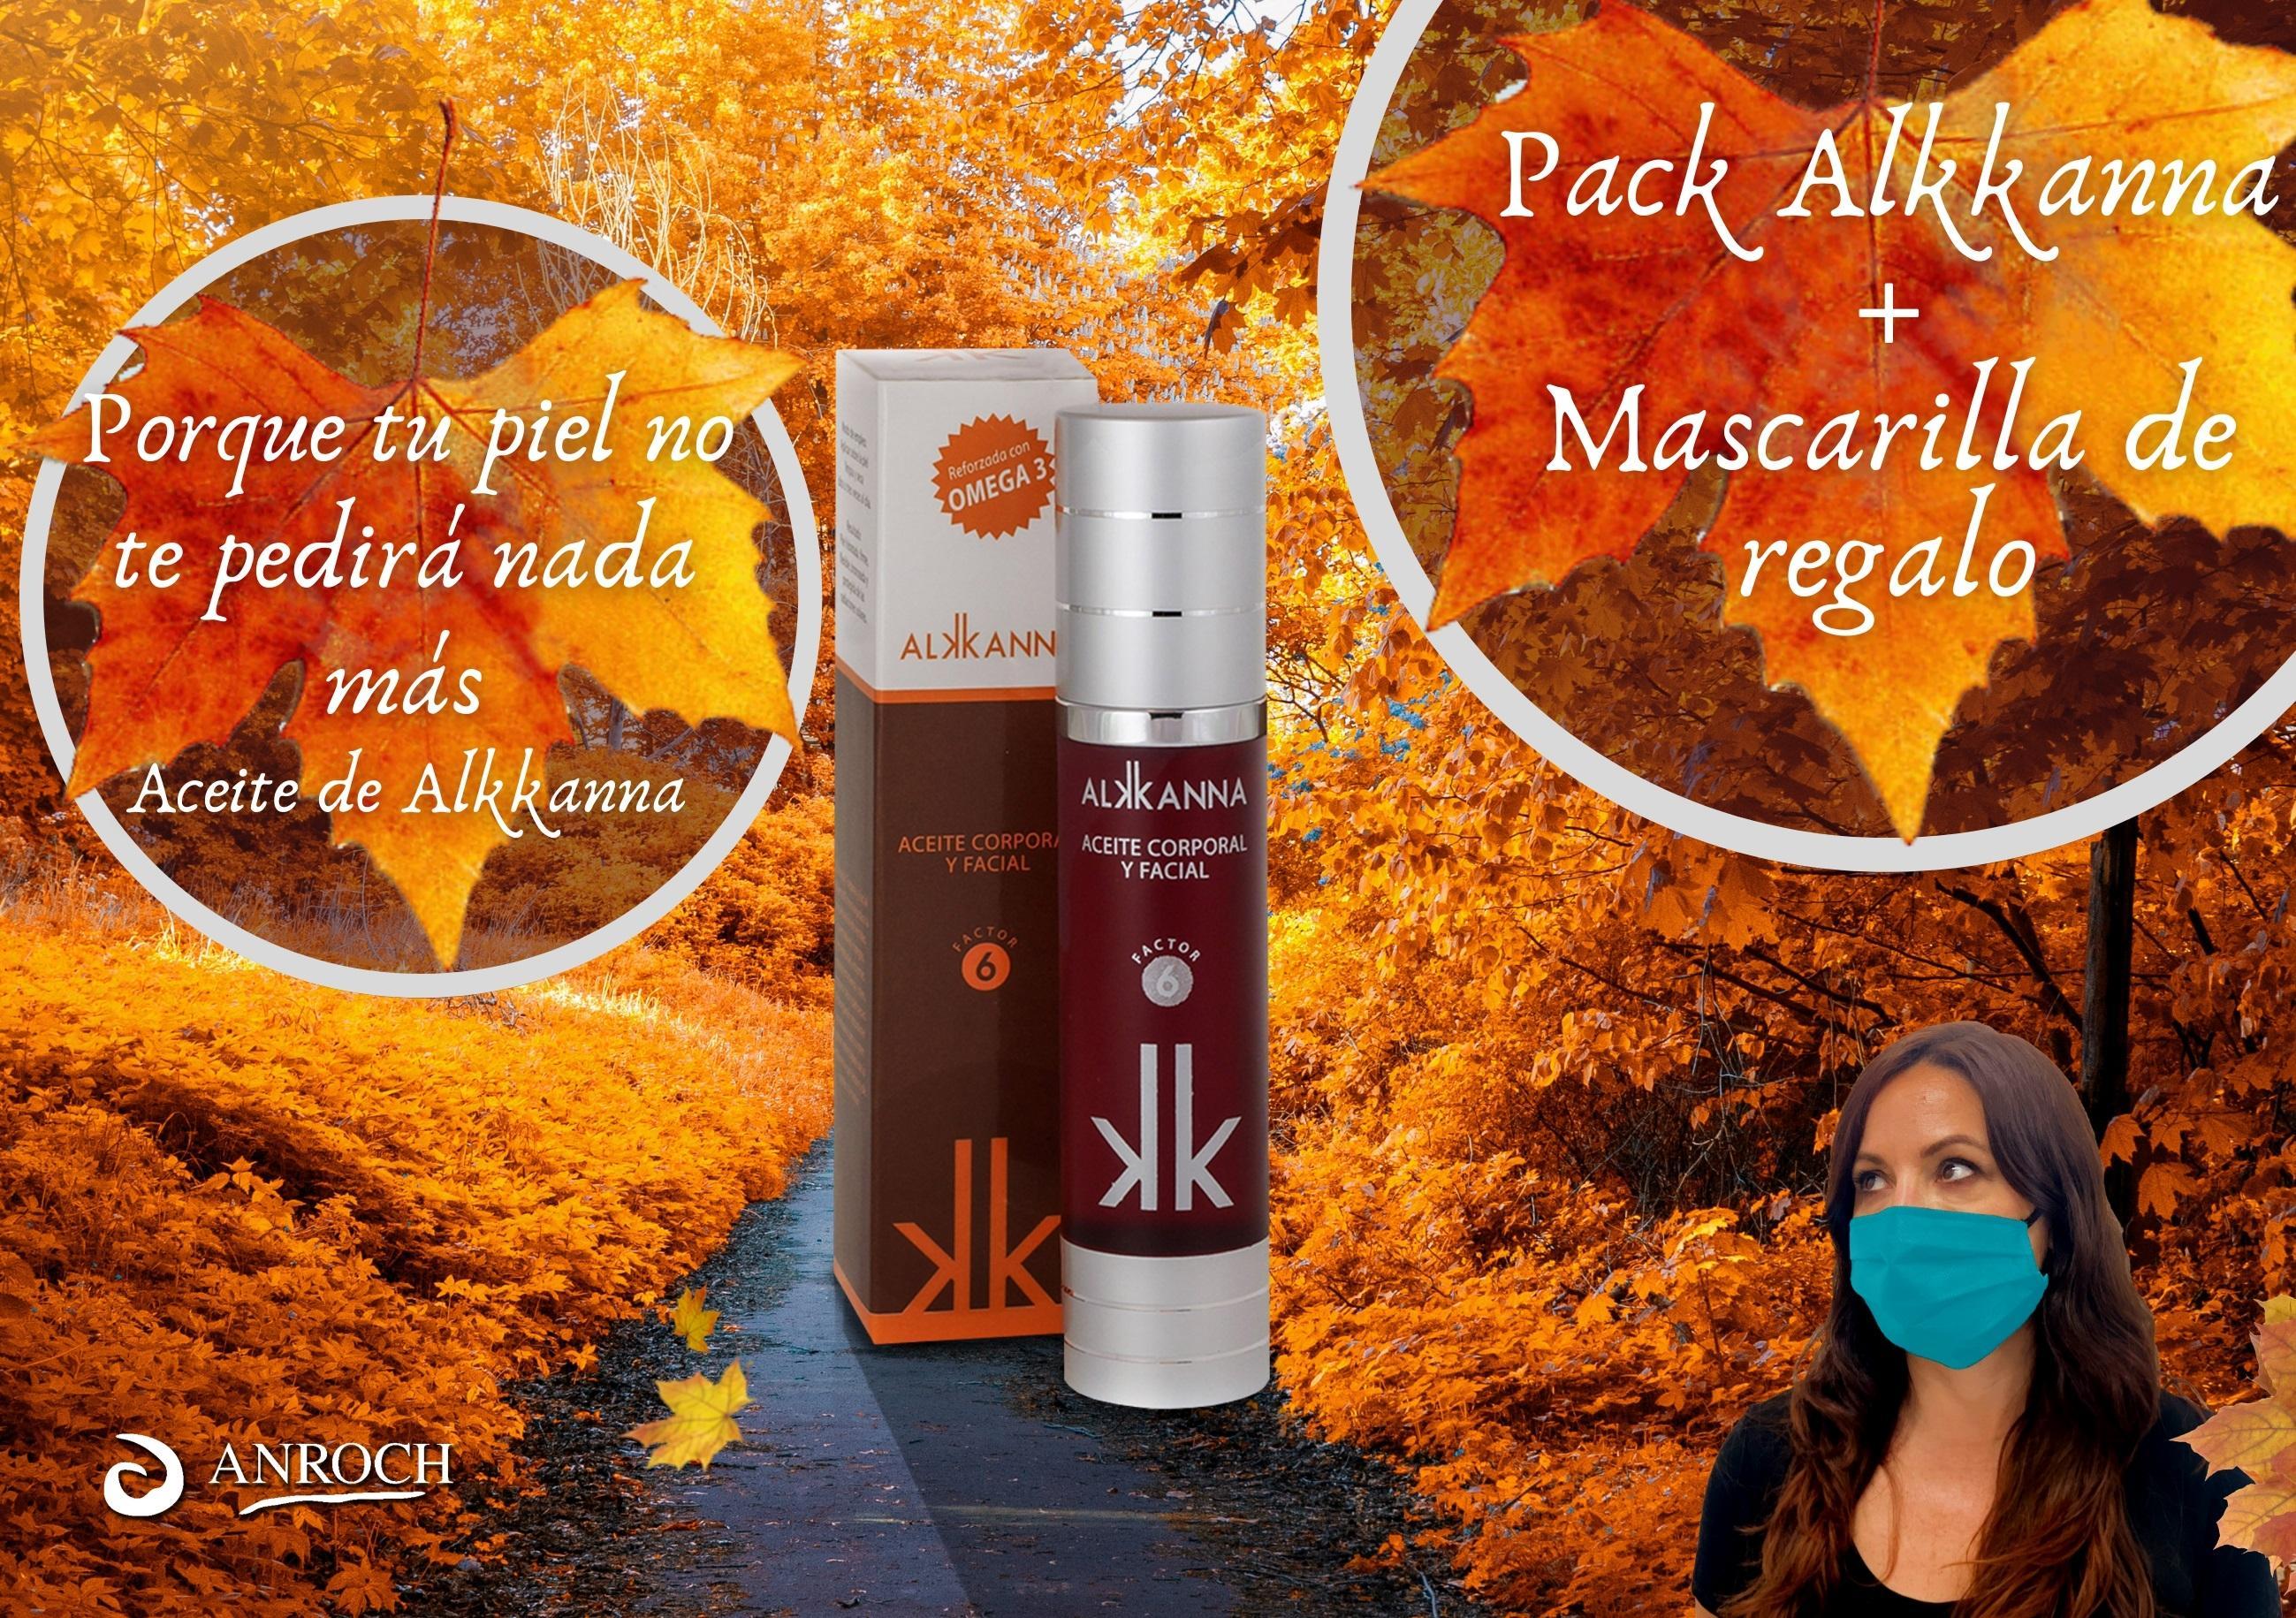 PACK ALKKANNA: 2 aceites de Alkkanna + UNA MASCARILLA  REUTILIZABLE, REVERSIBLE, DOBLE BARRERA DE REGALO